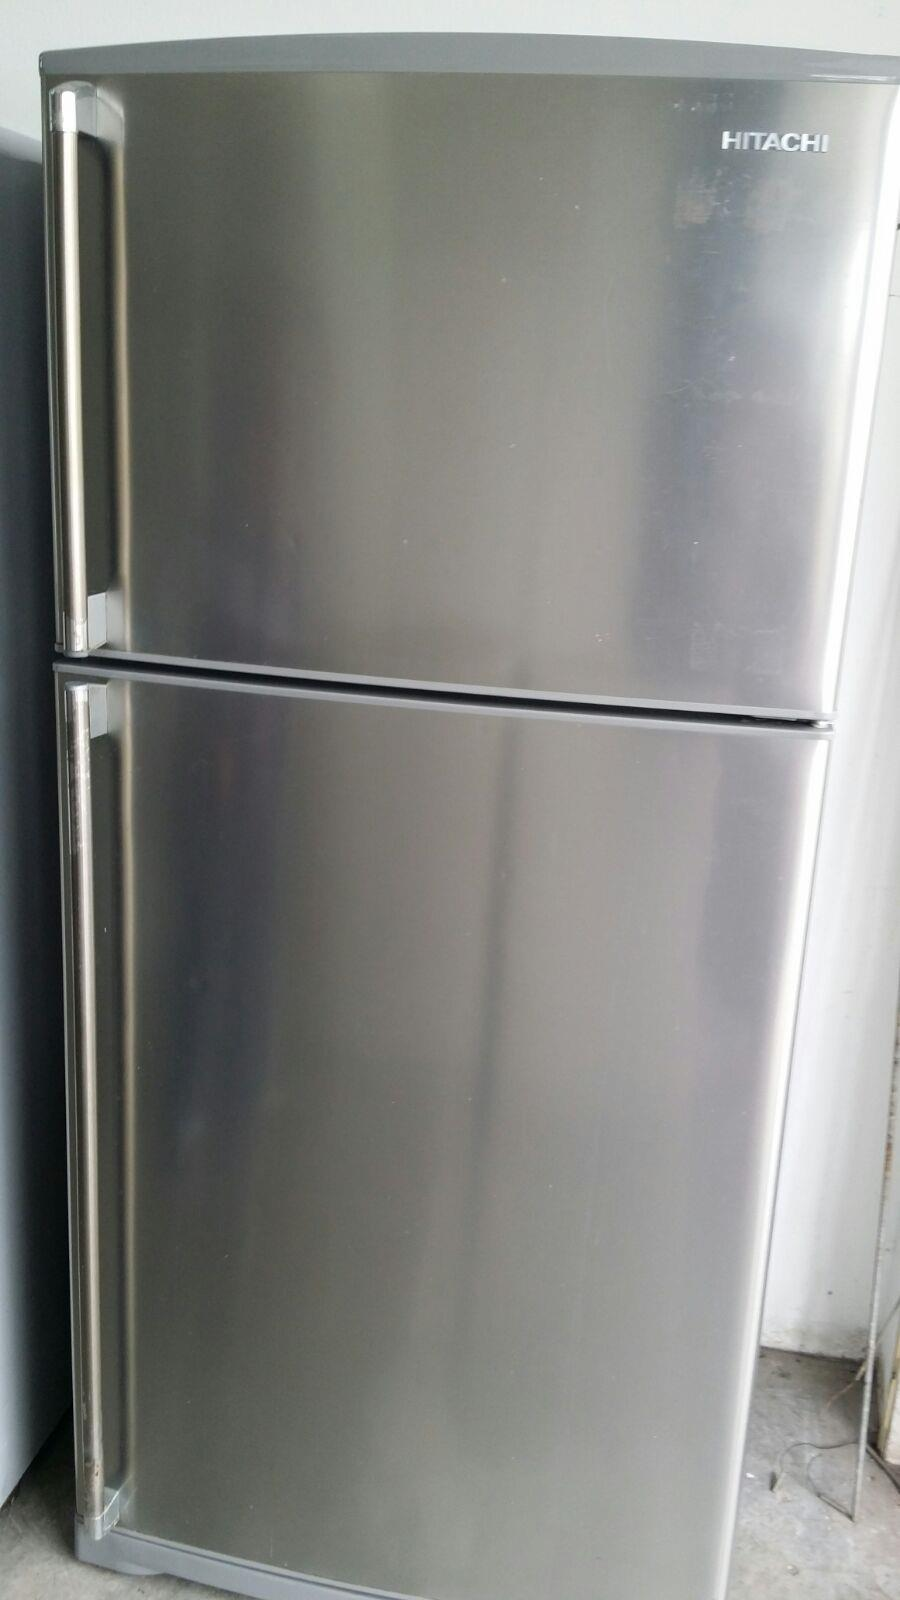 Huge Refrigerator Huge Hitachi Fridge Refrigerator Pe End 2 17 2016 1258 Pm